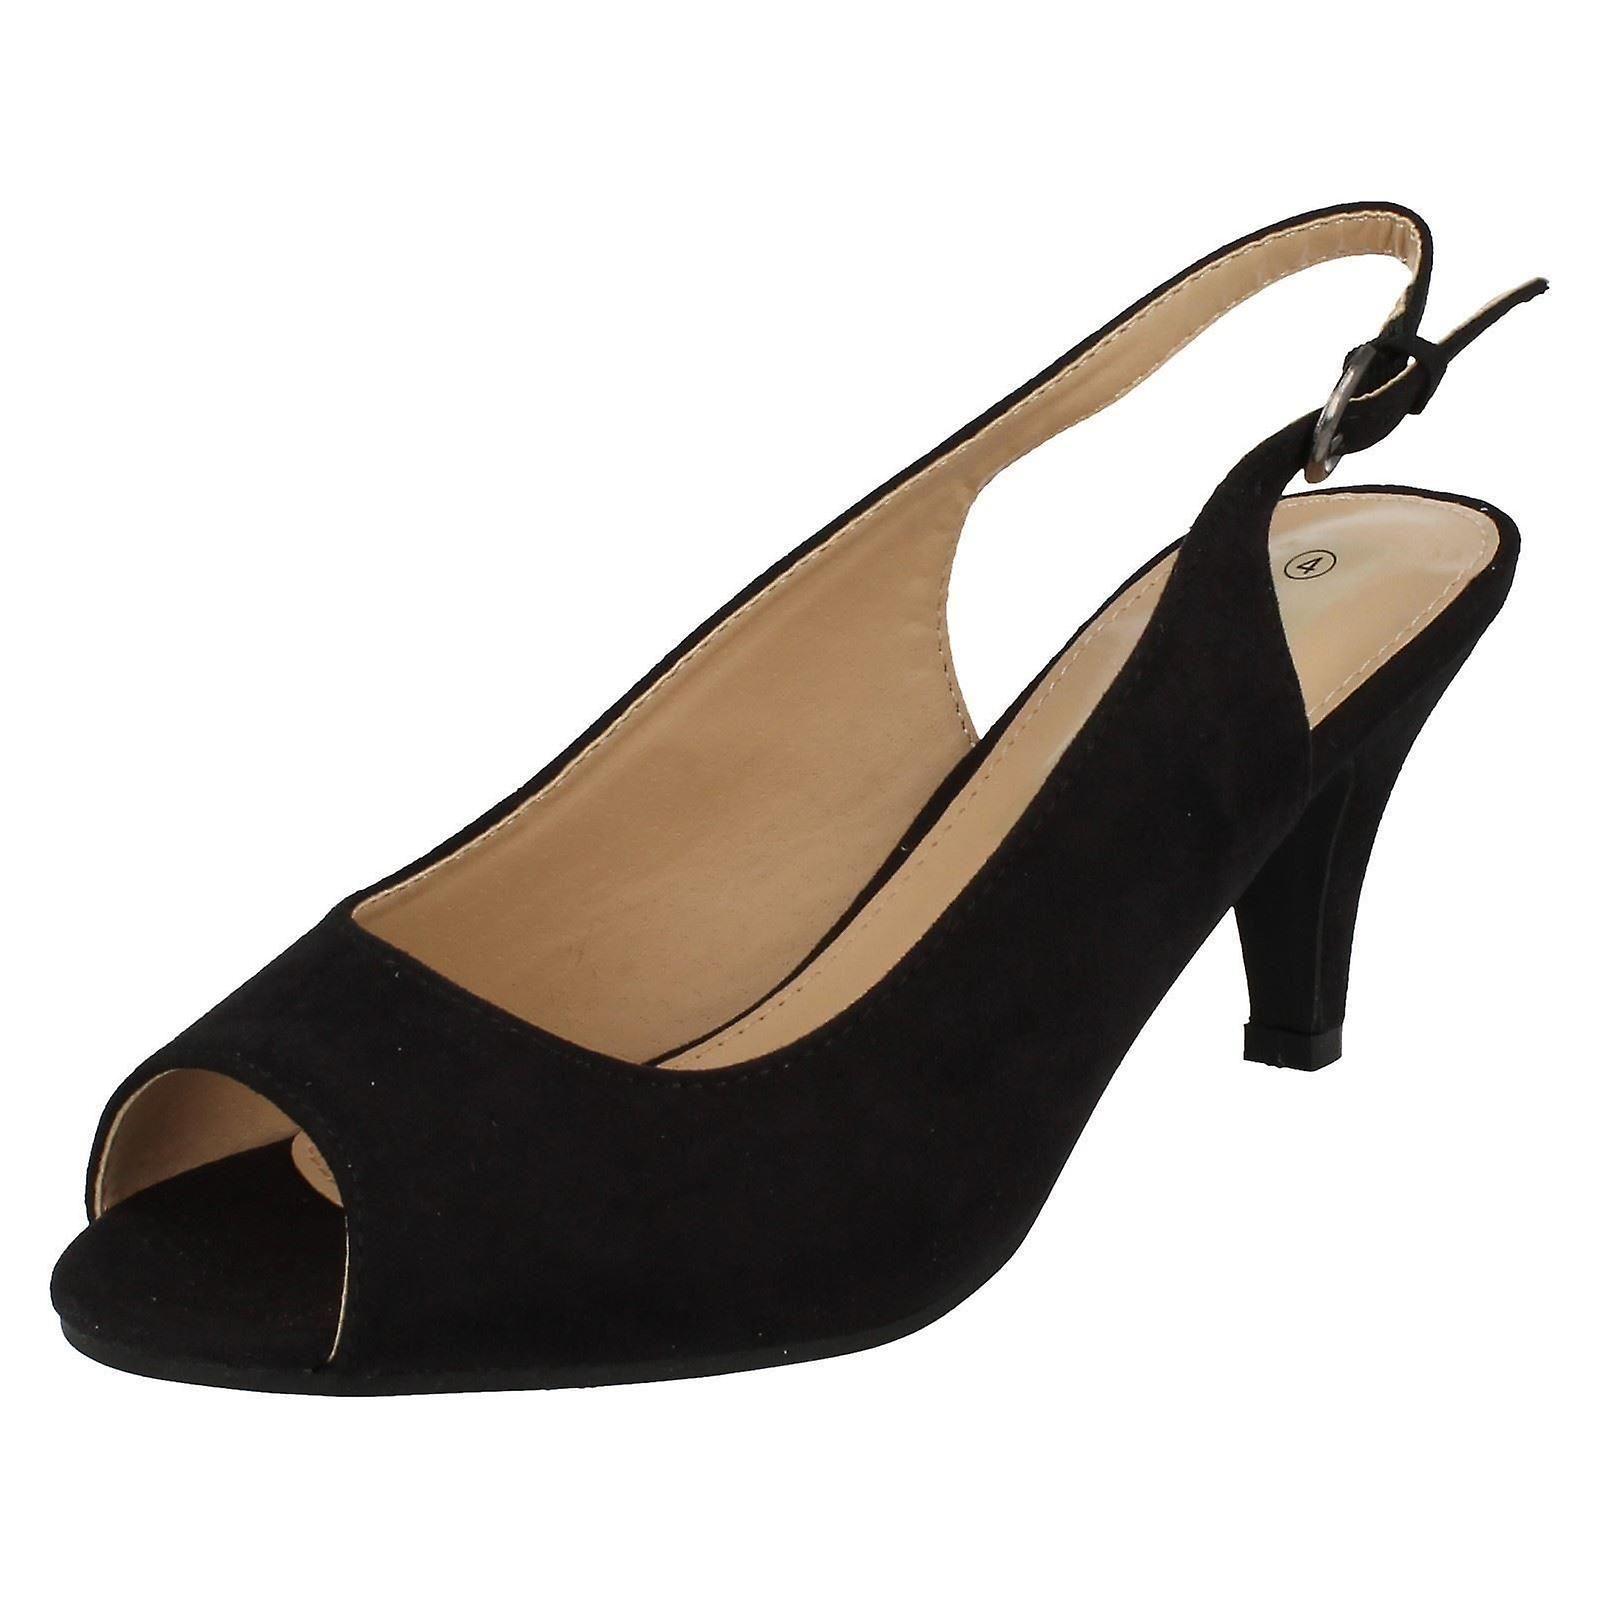 Le signore Anne Michelle Peep Toe Sling Back Shoes F10593